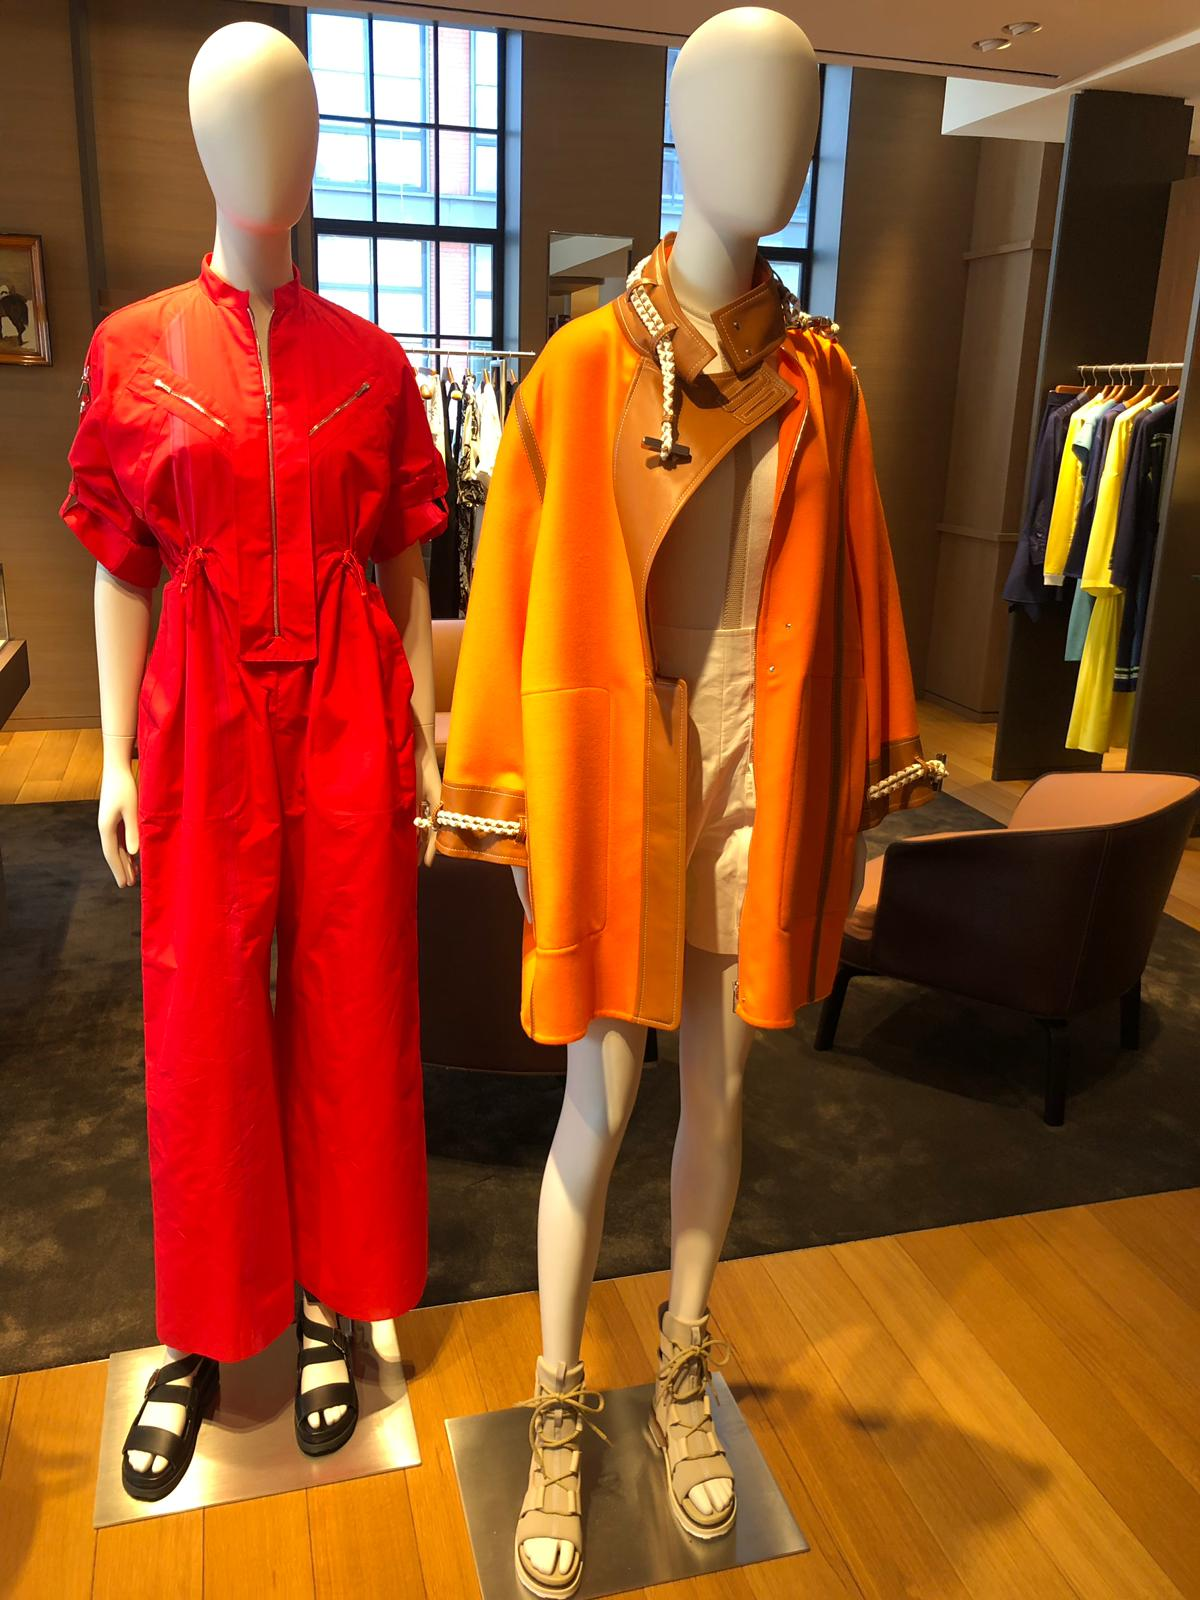 post 41 - nova loja da Hermès em NY (4)